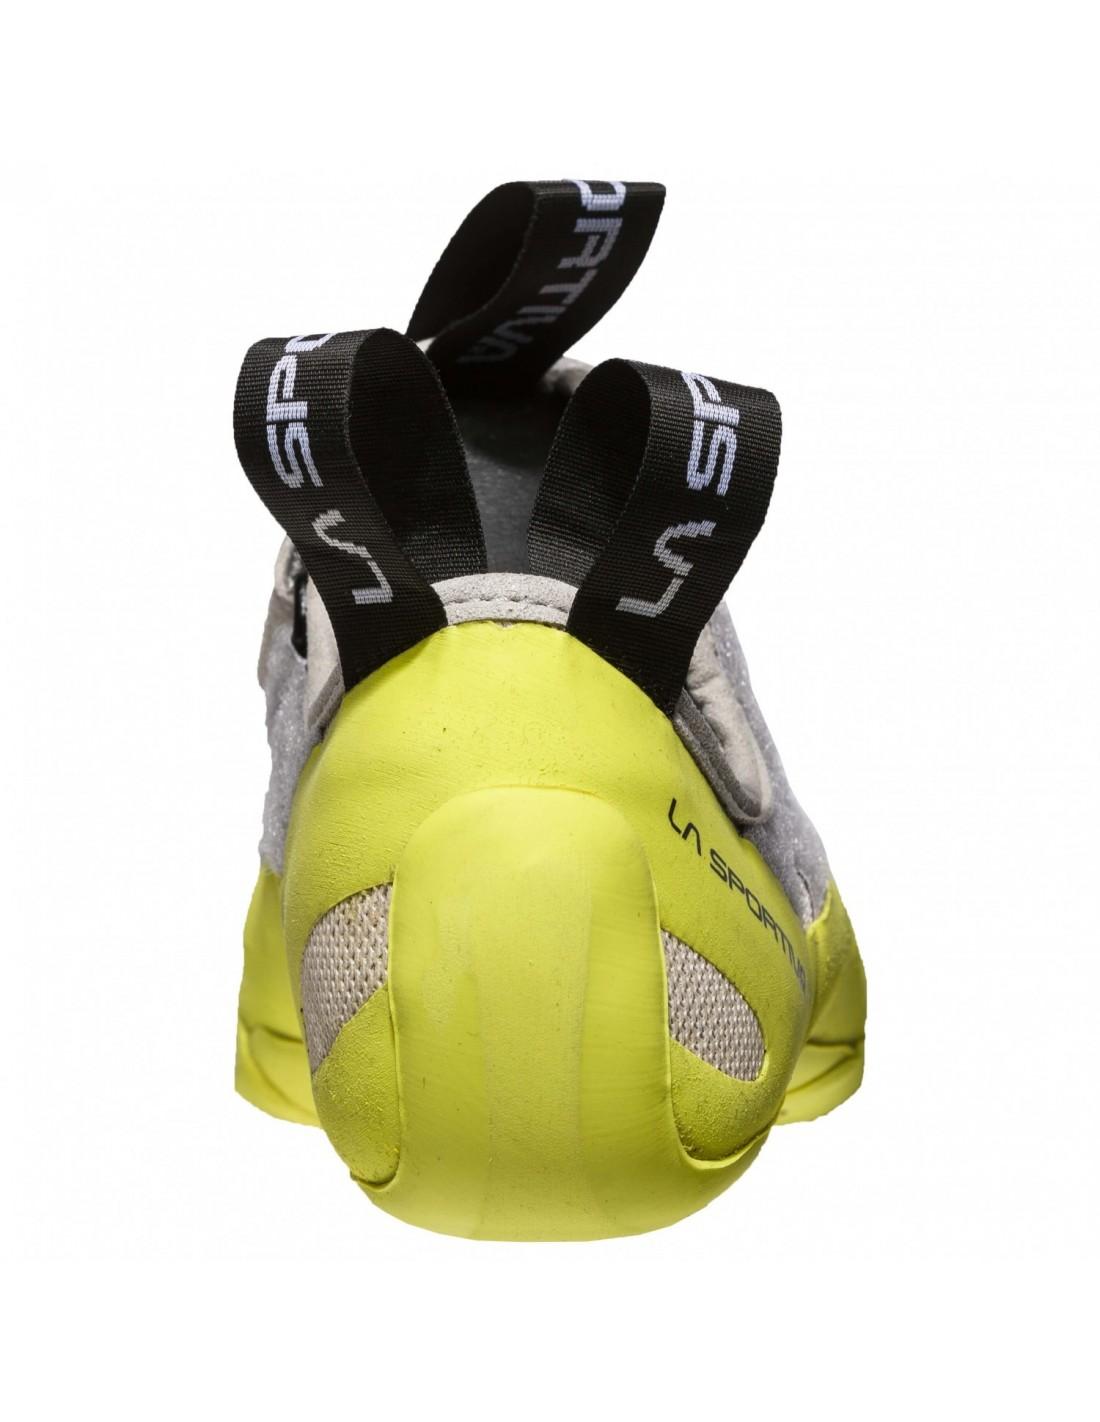 La Sportiva Geckogym Kletterschuh Woman Greyapple Kl1FJc